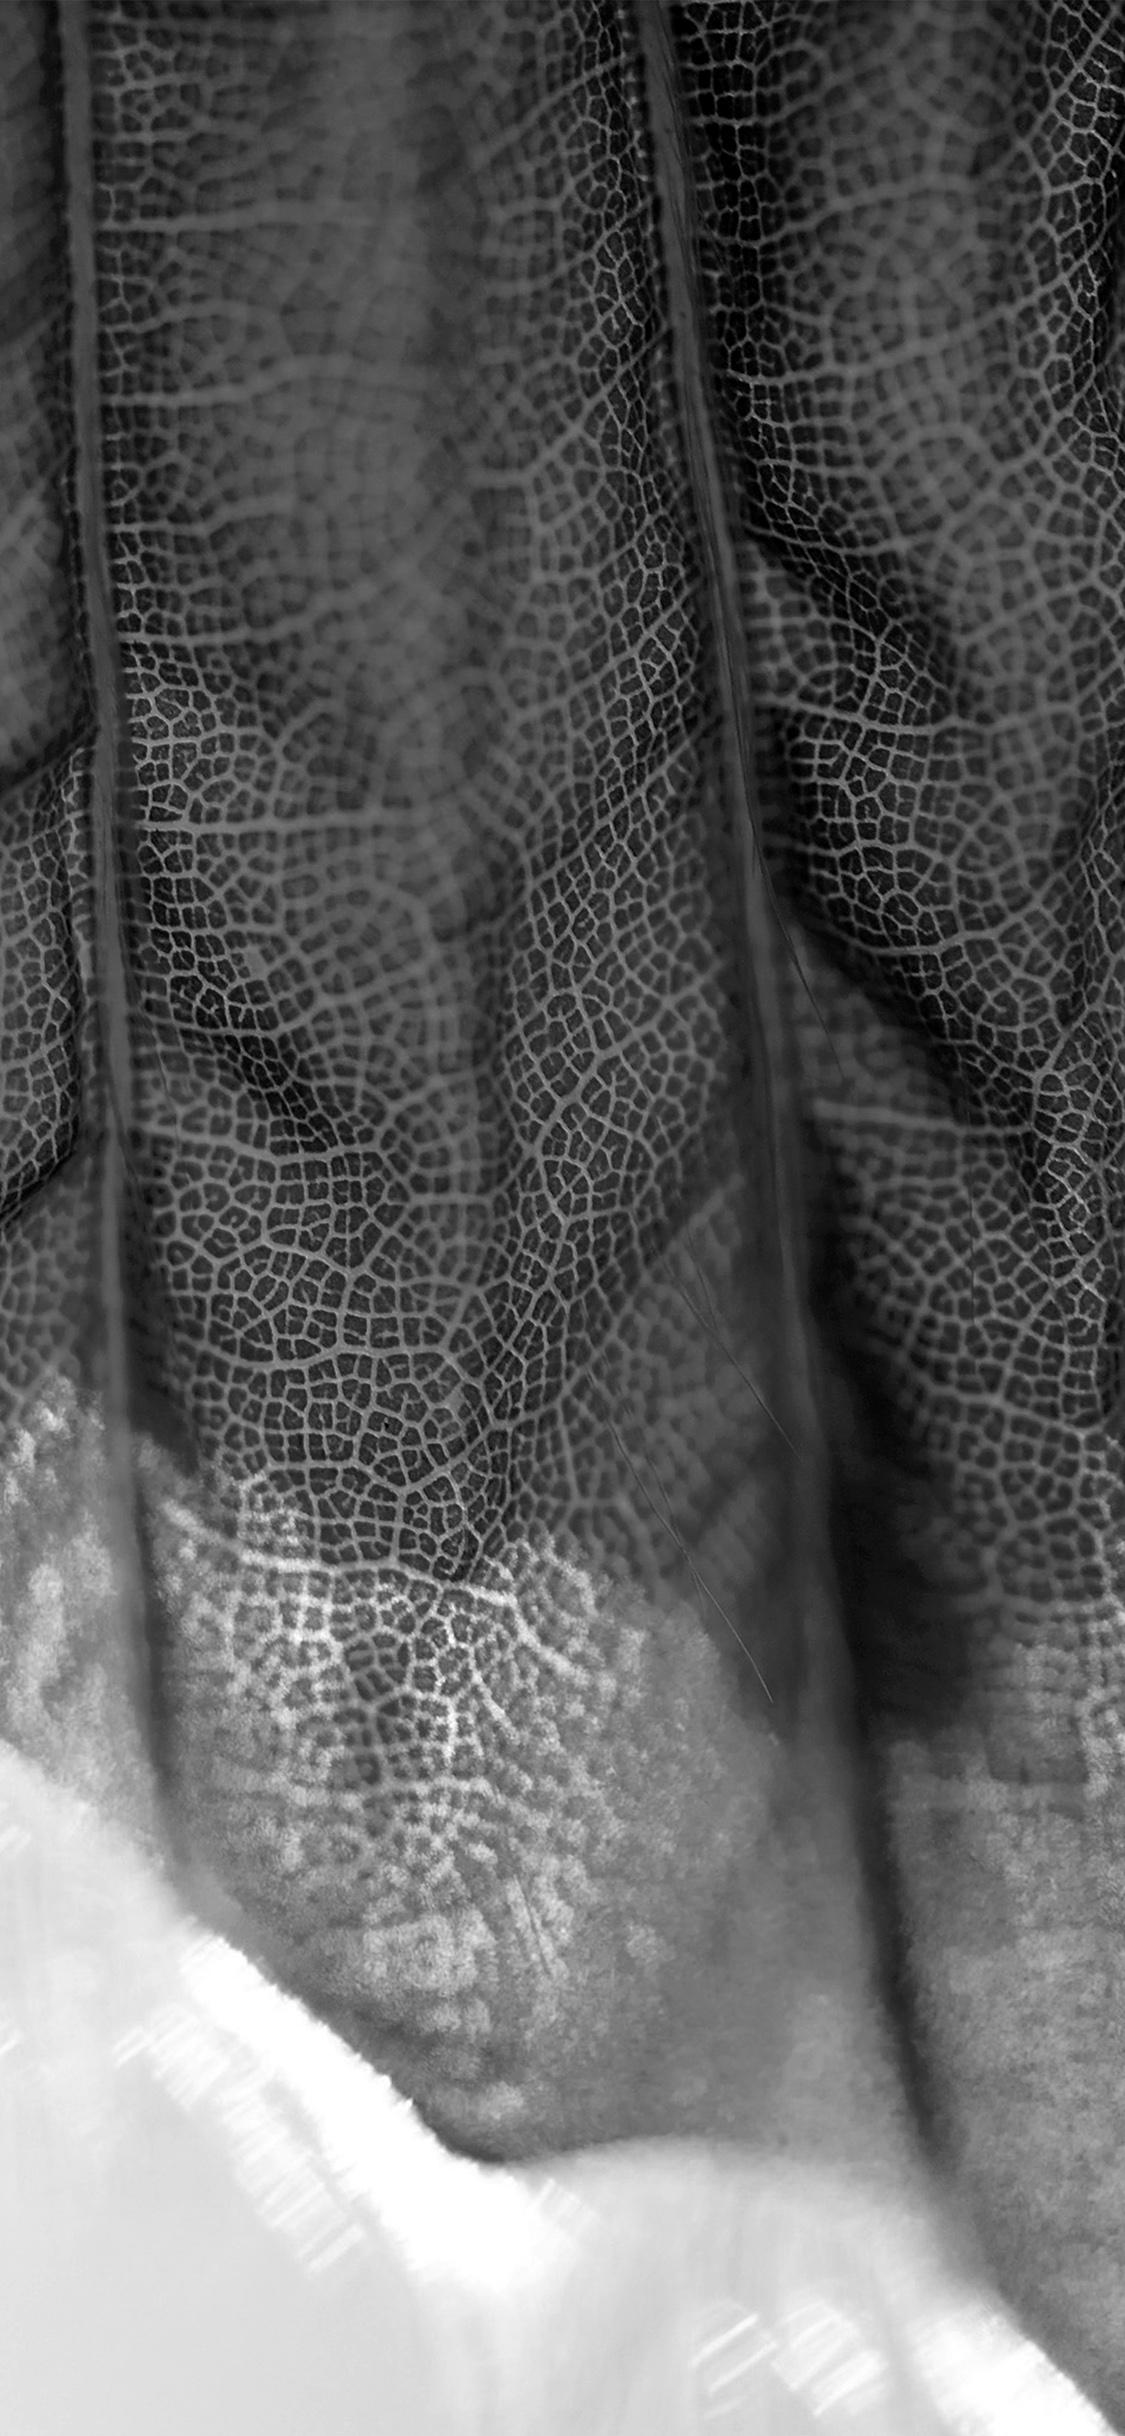 iPhoneXpapers.com-Apple-iPhone-wallpaper-vr94-lifelines-leaf-flower-pattern-dark-bw-nature